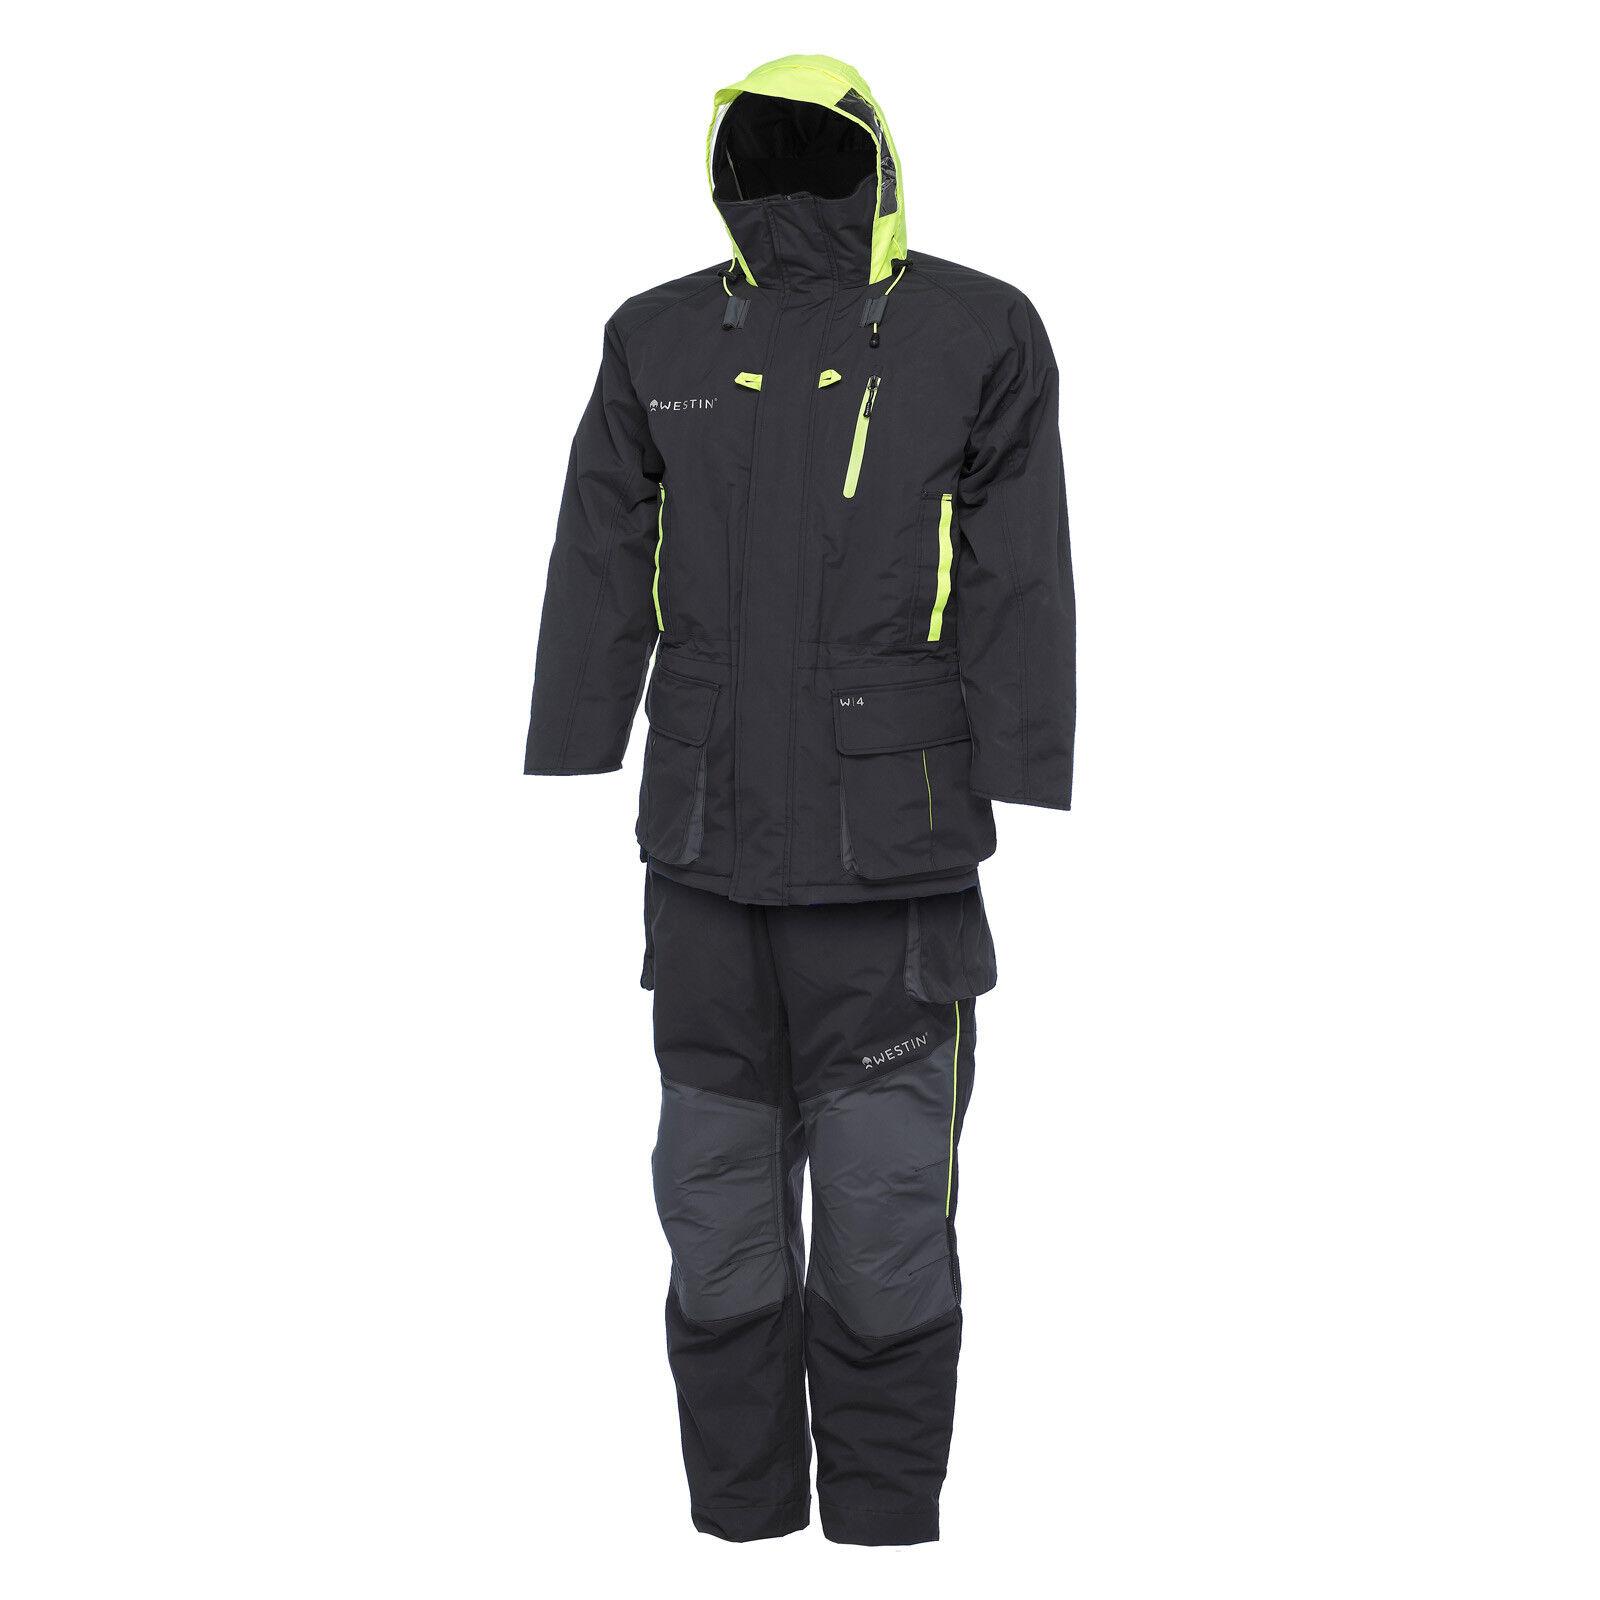 Westin thermoanzug invierno traje ropa angel-invierno Suit tamaño xl